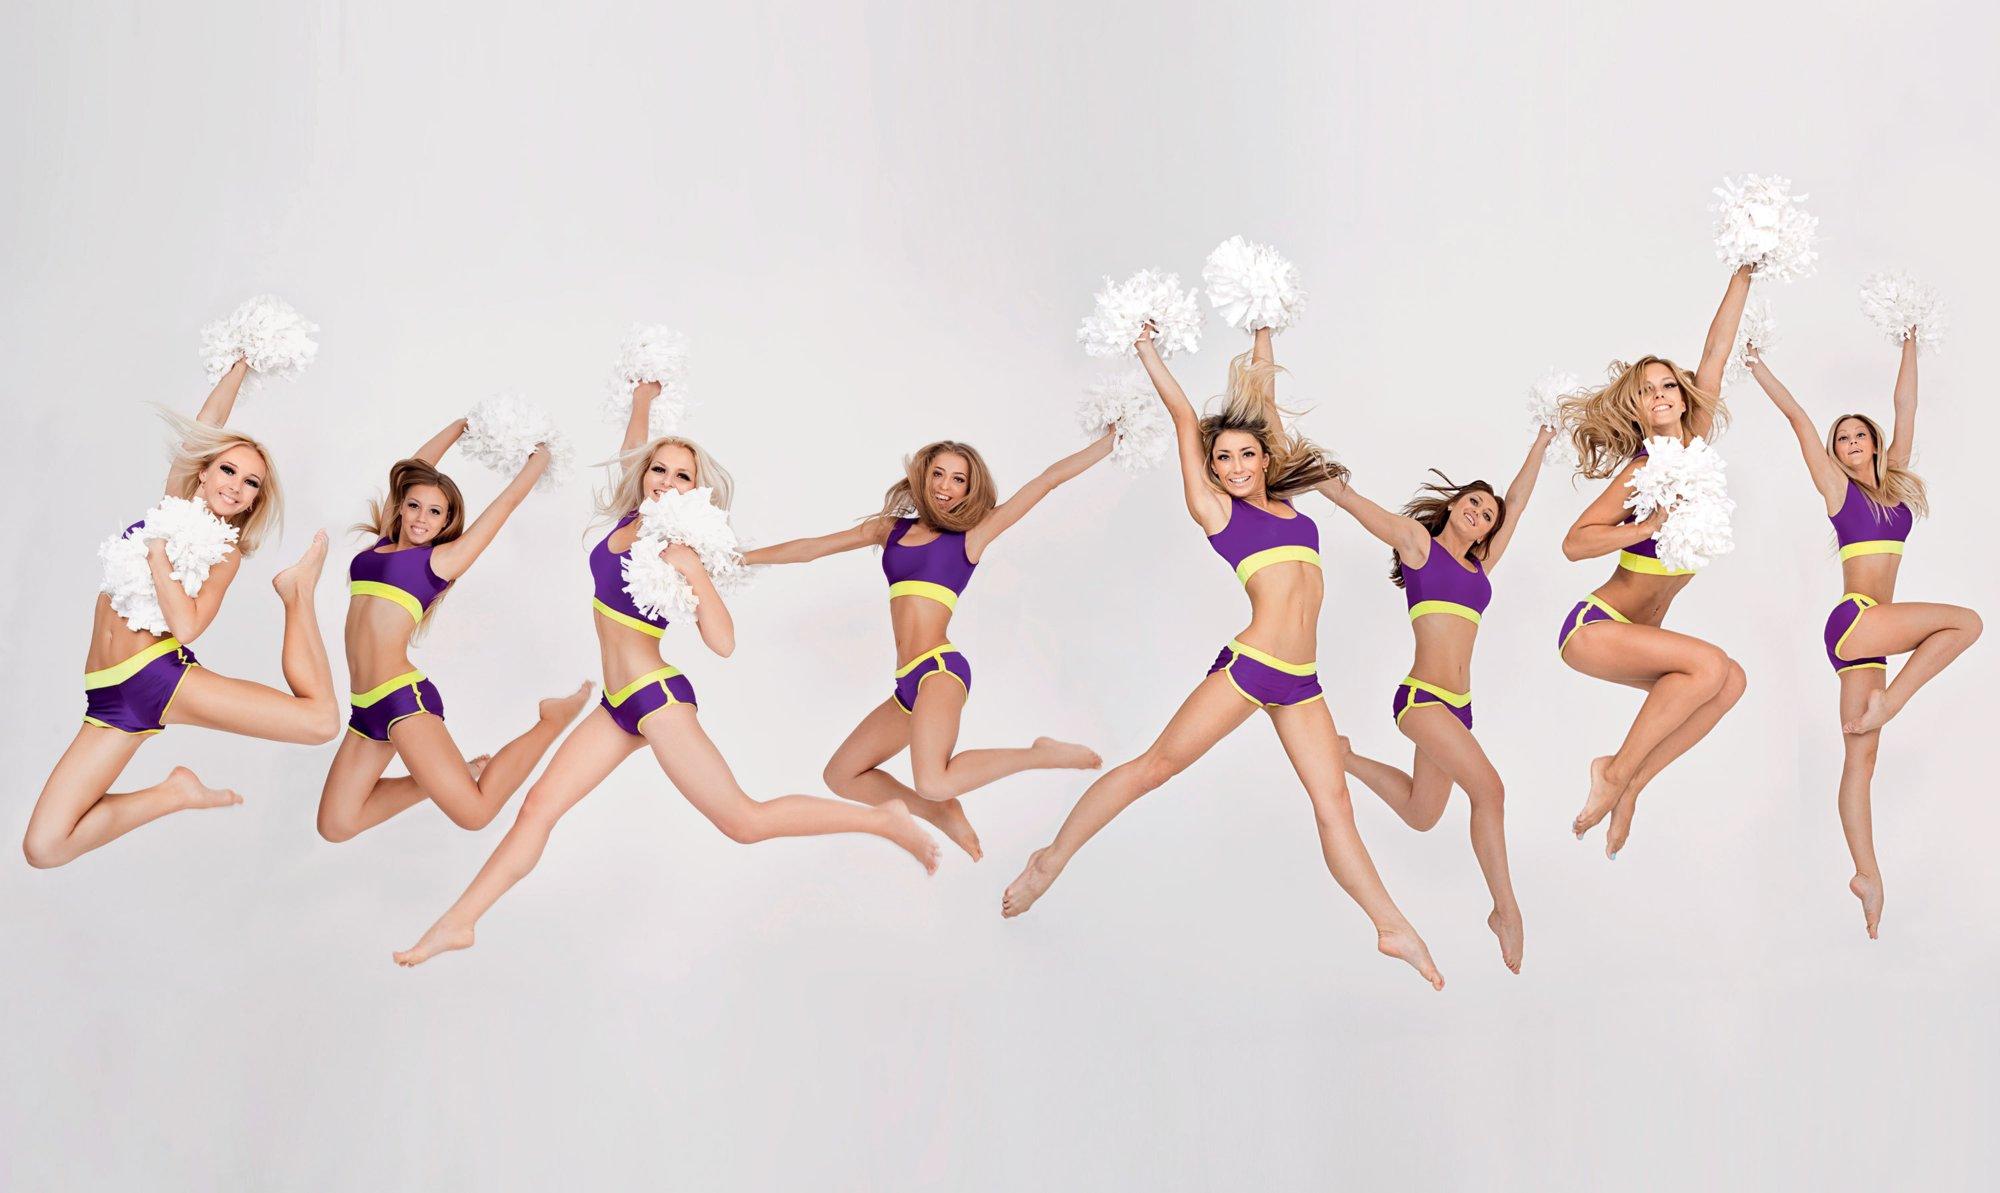 Cheer Weekend: яркое шоу для тех, кто умеет болеть за любимую команду